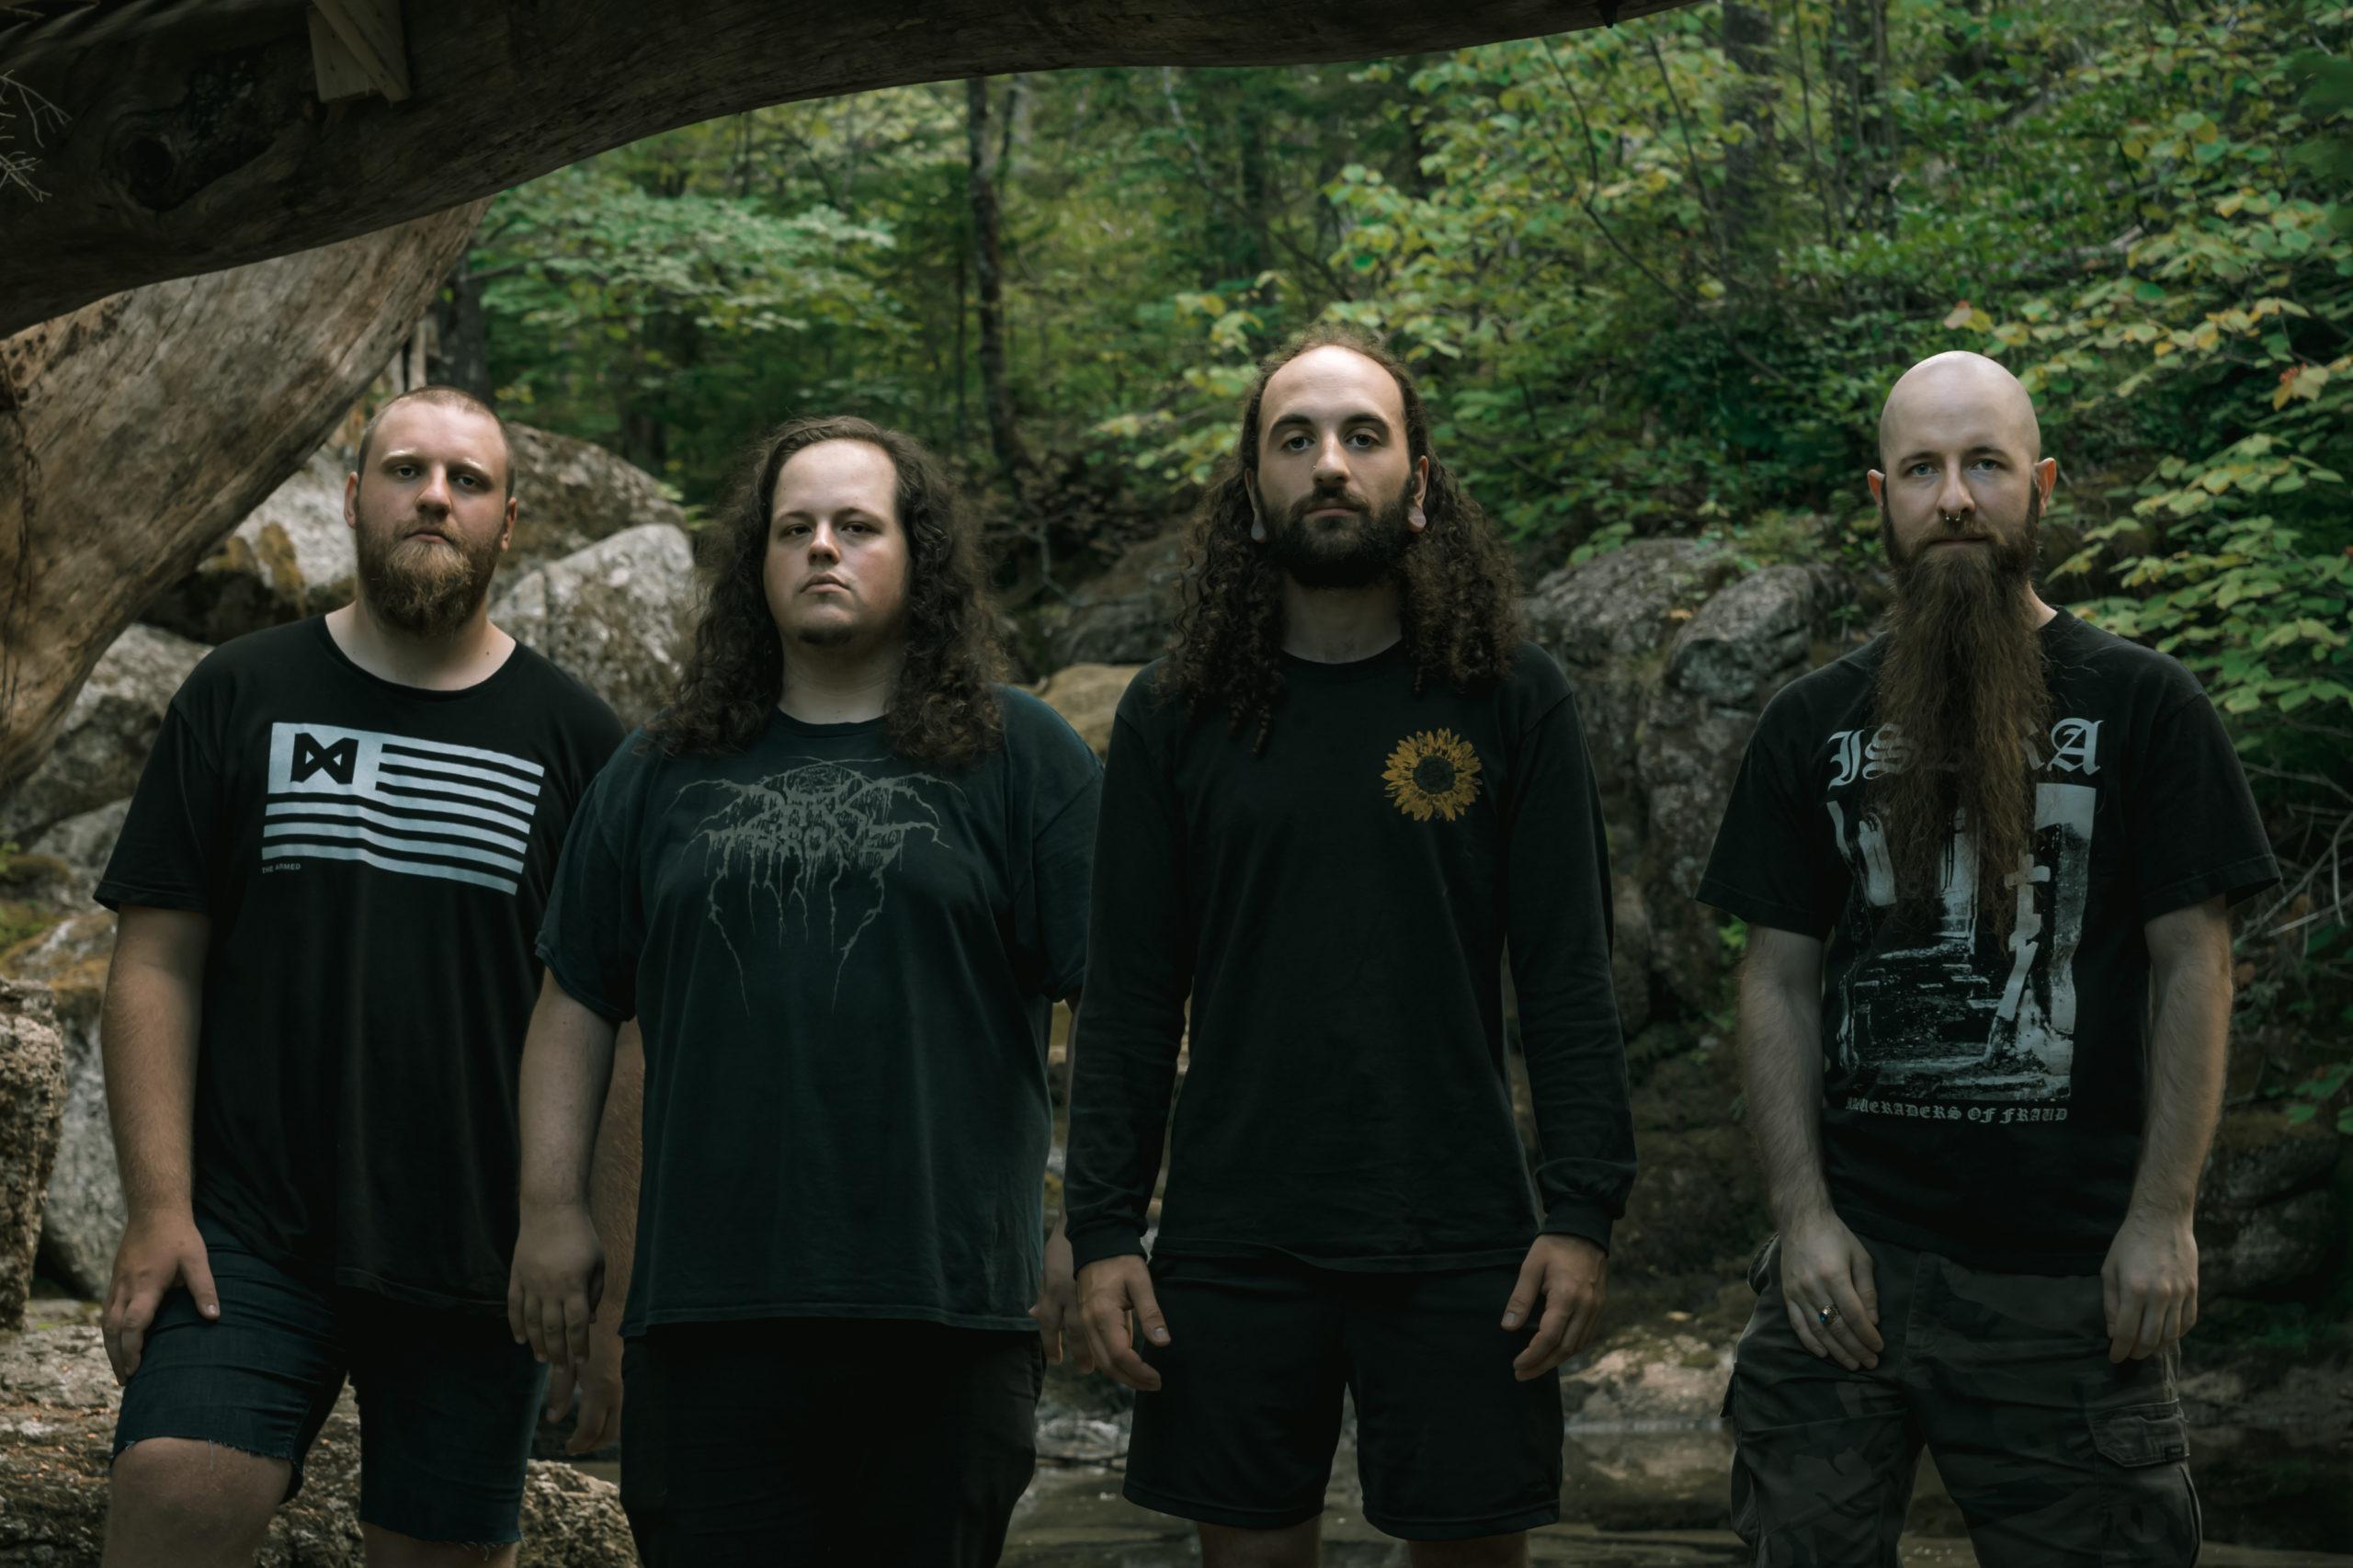 Review de The Veil, álbum debut de Ancient Thrones